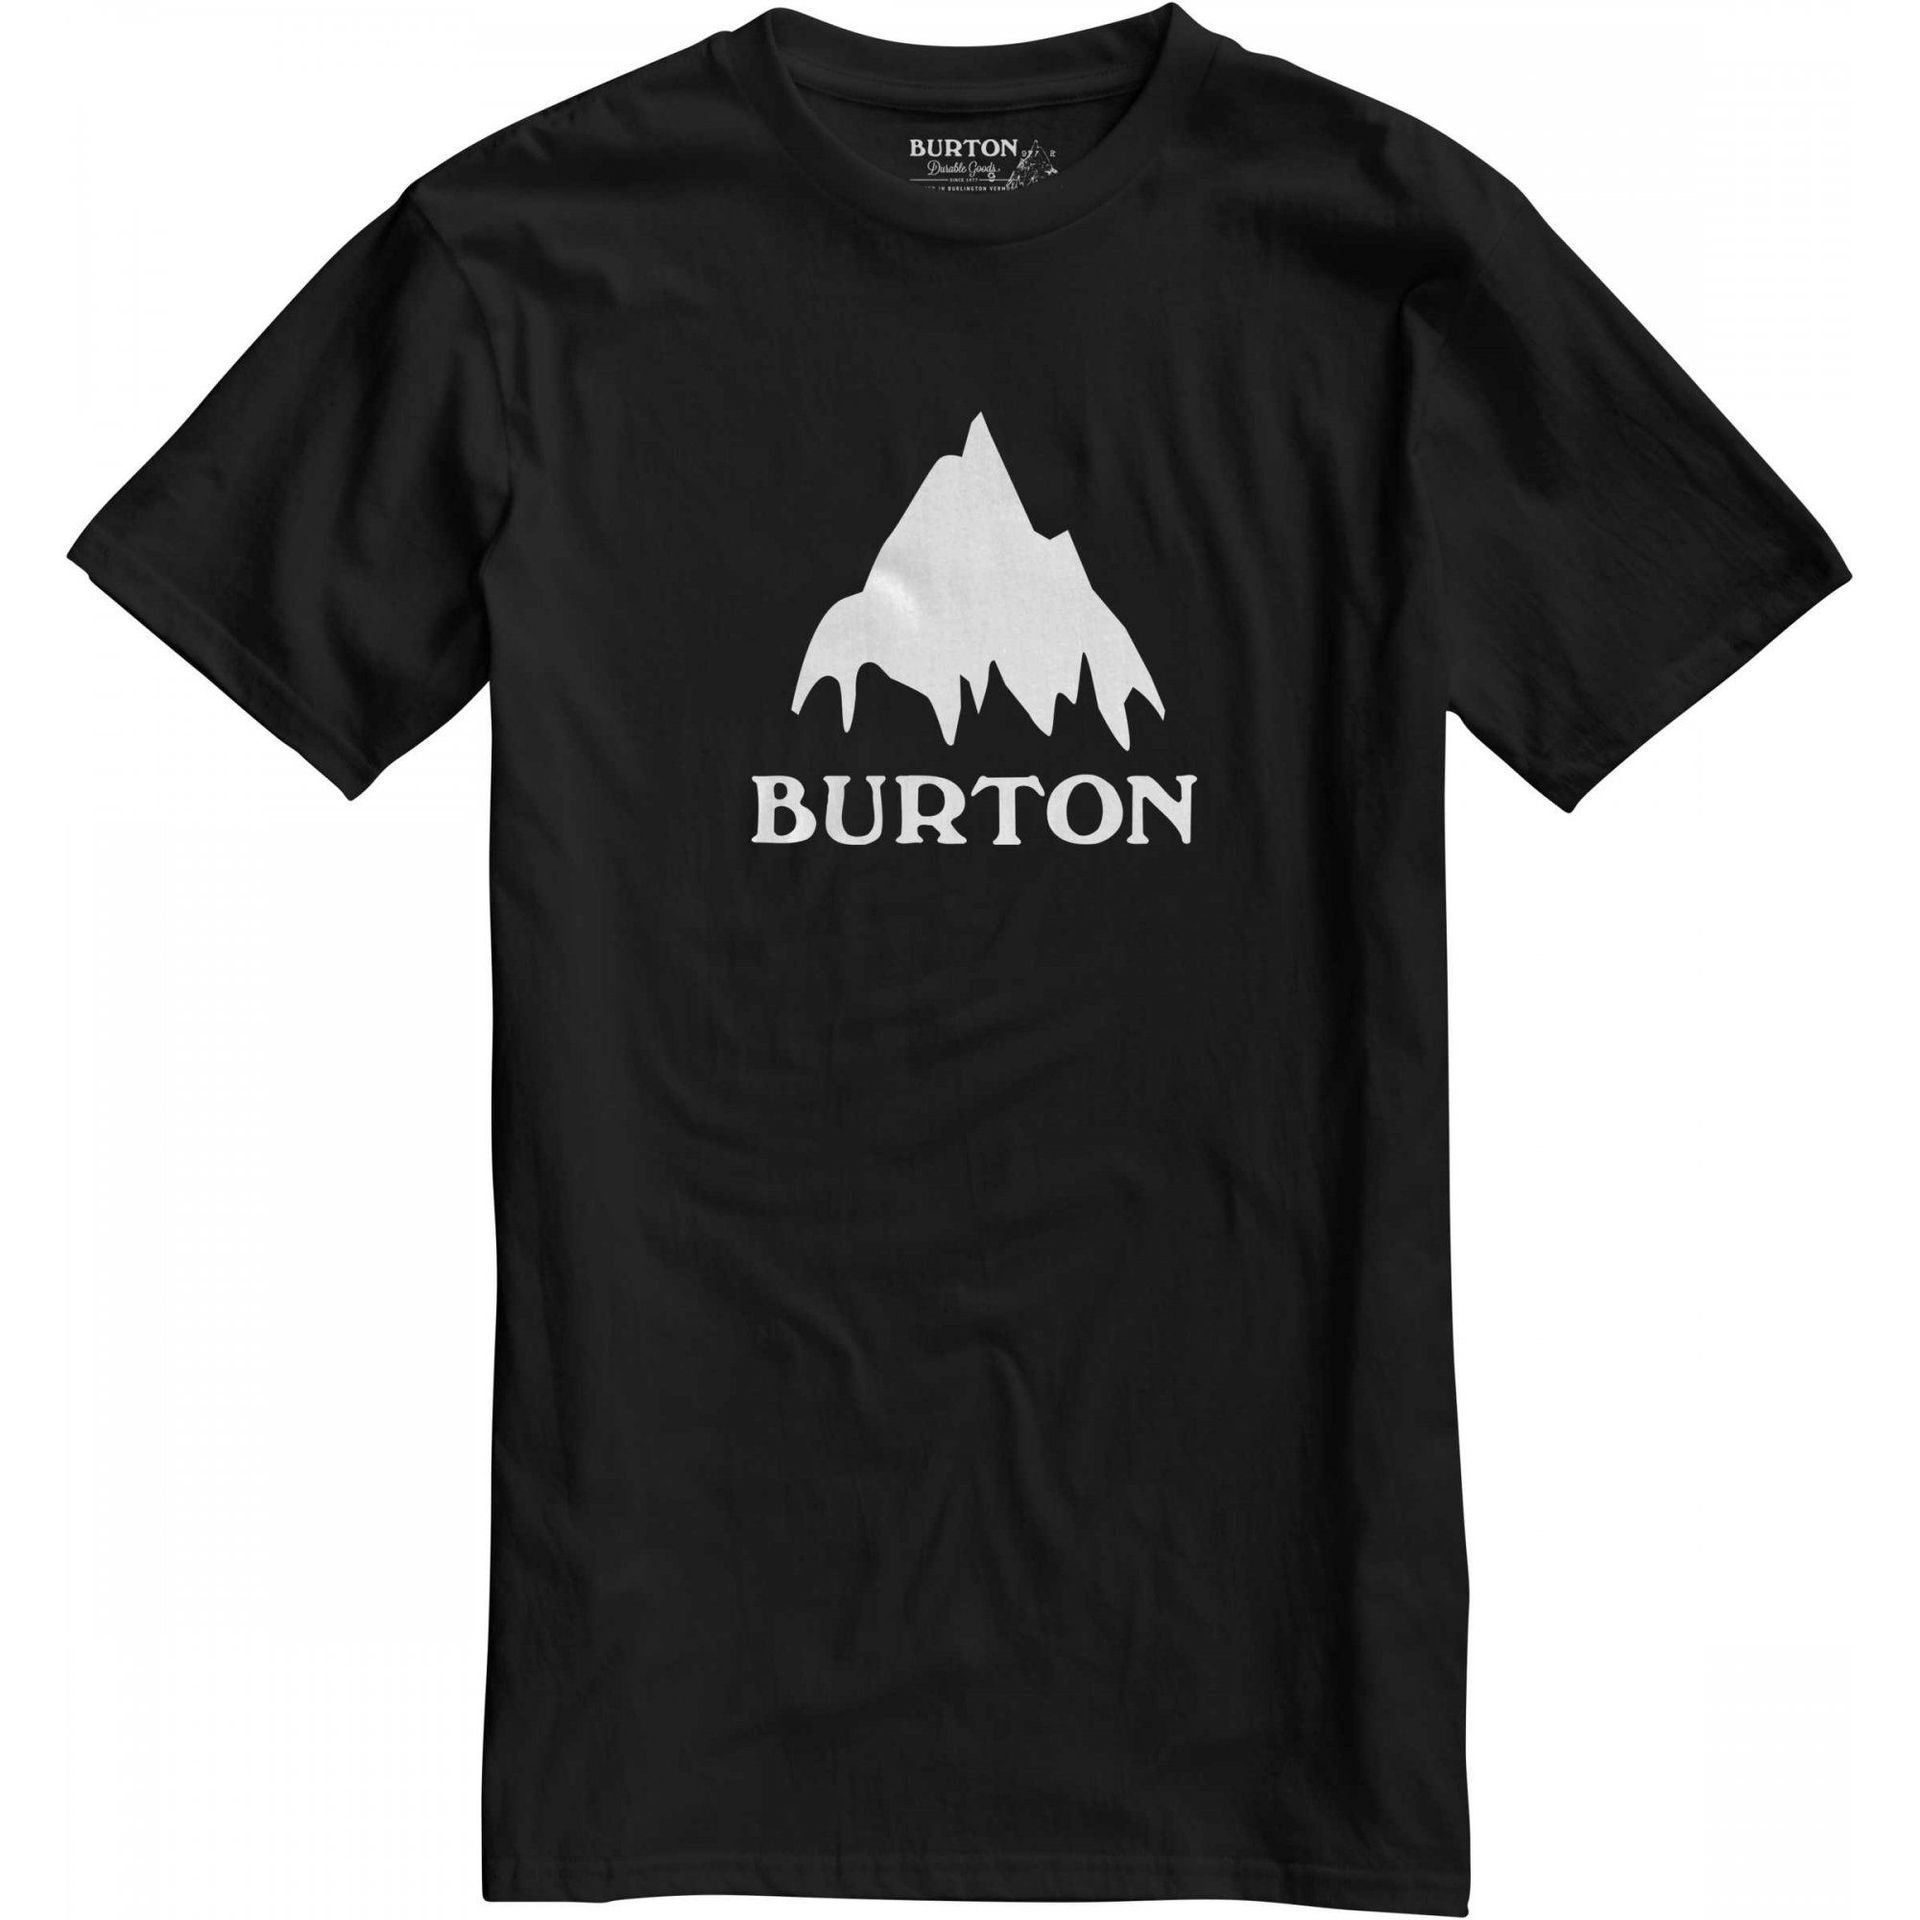 T-SHIRT BURTON CLASSIC MOUNTAIN SHORT SLEEVER TRUE BLACK